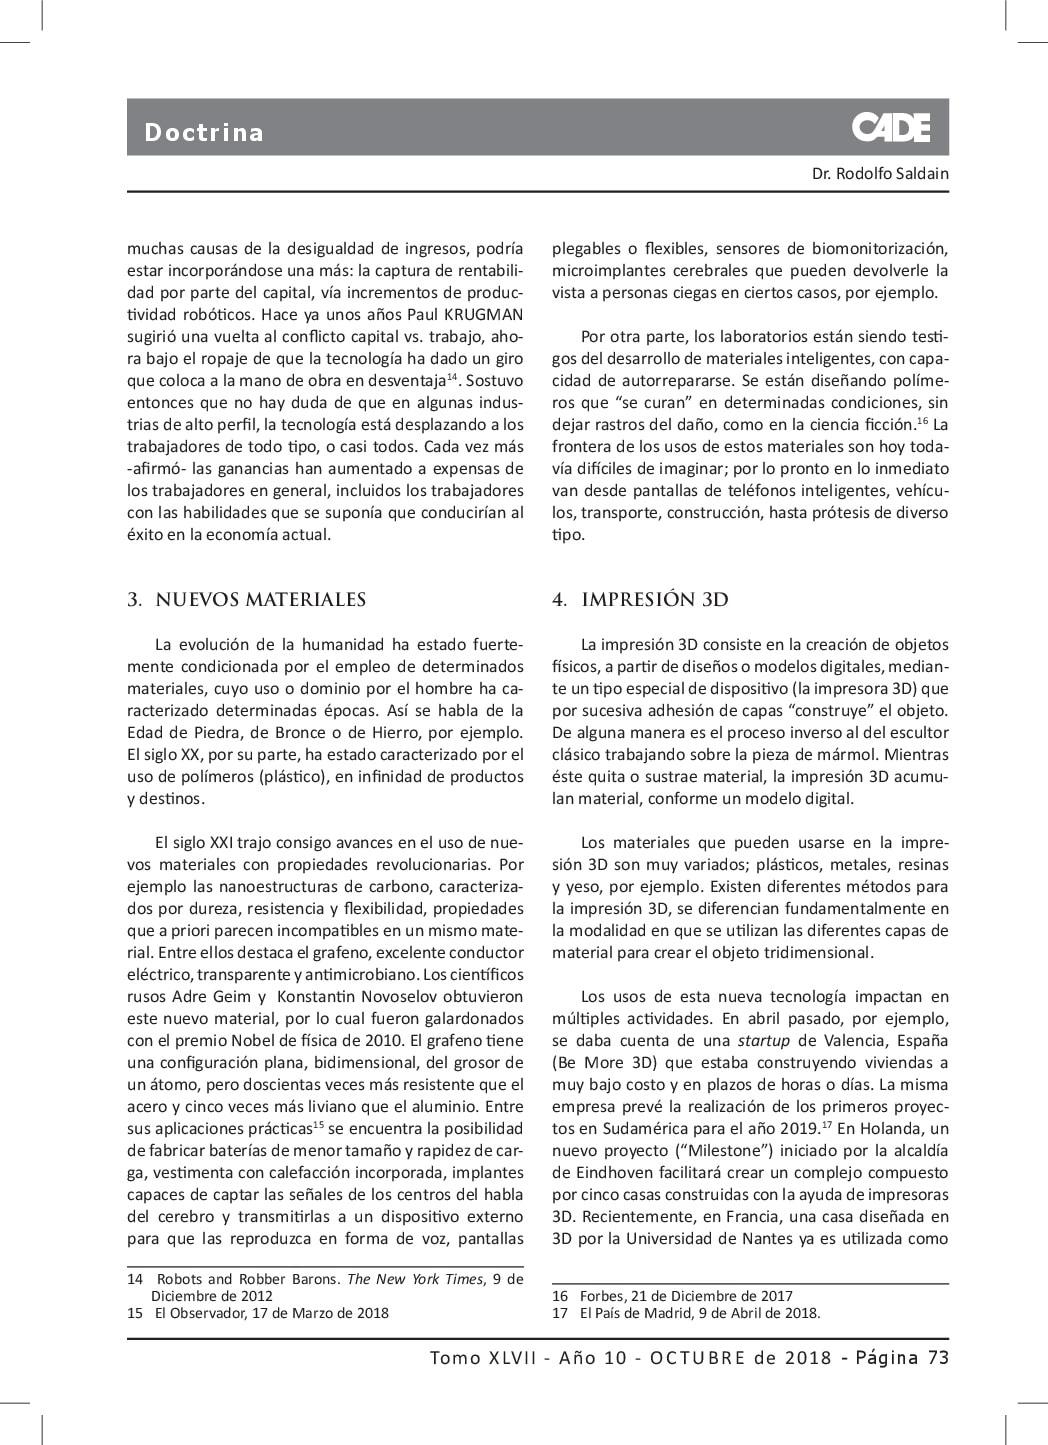 cade-doctrina-jurisprudencia-saldain-005